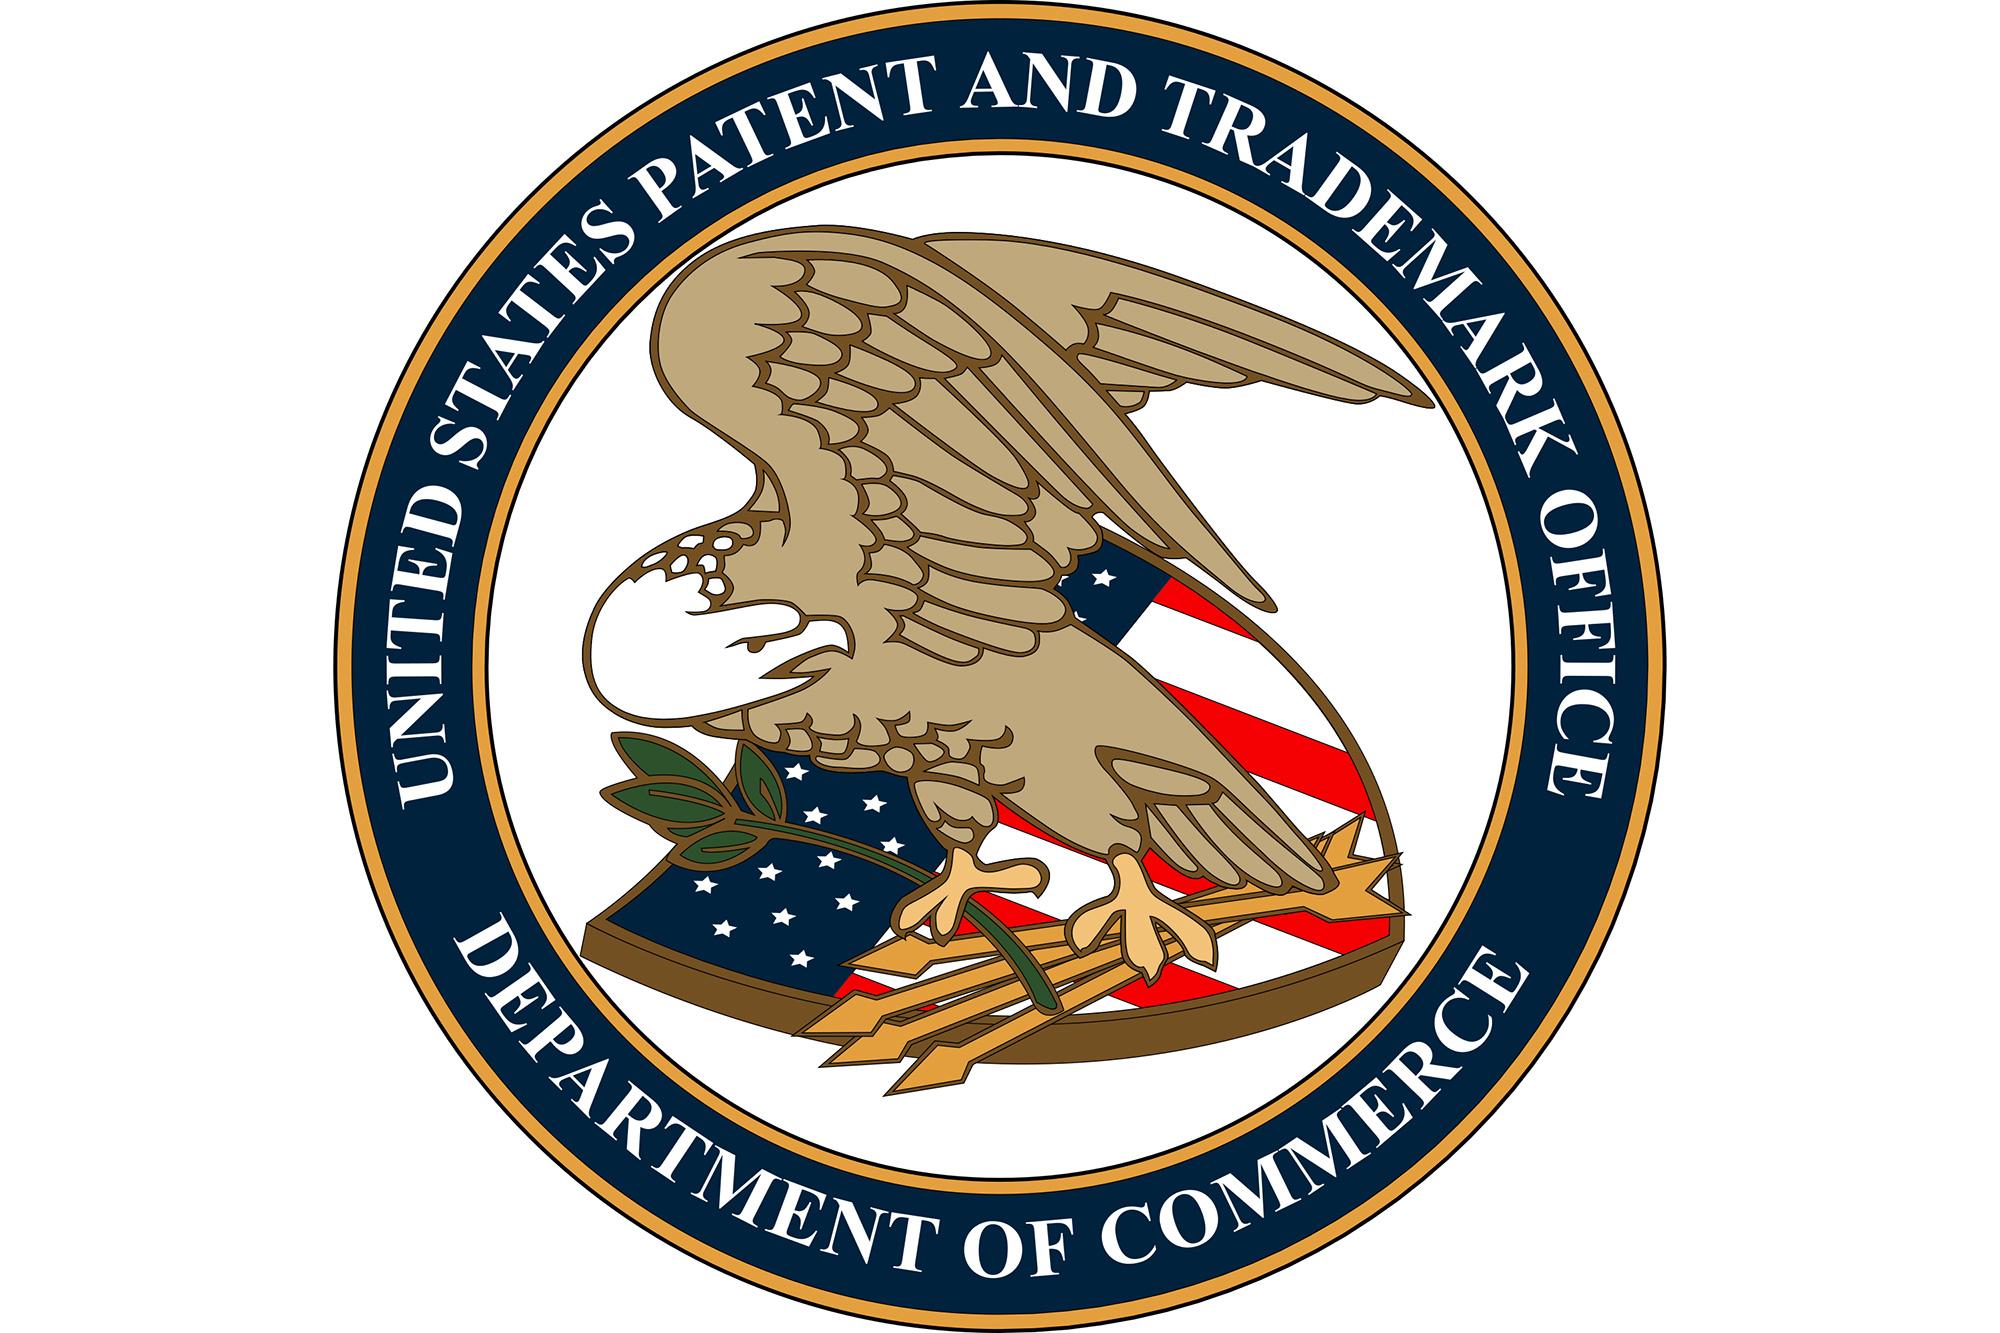 US Patent Office Belongs in Downtown